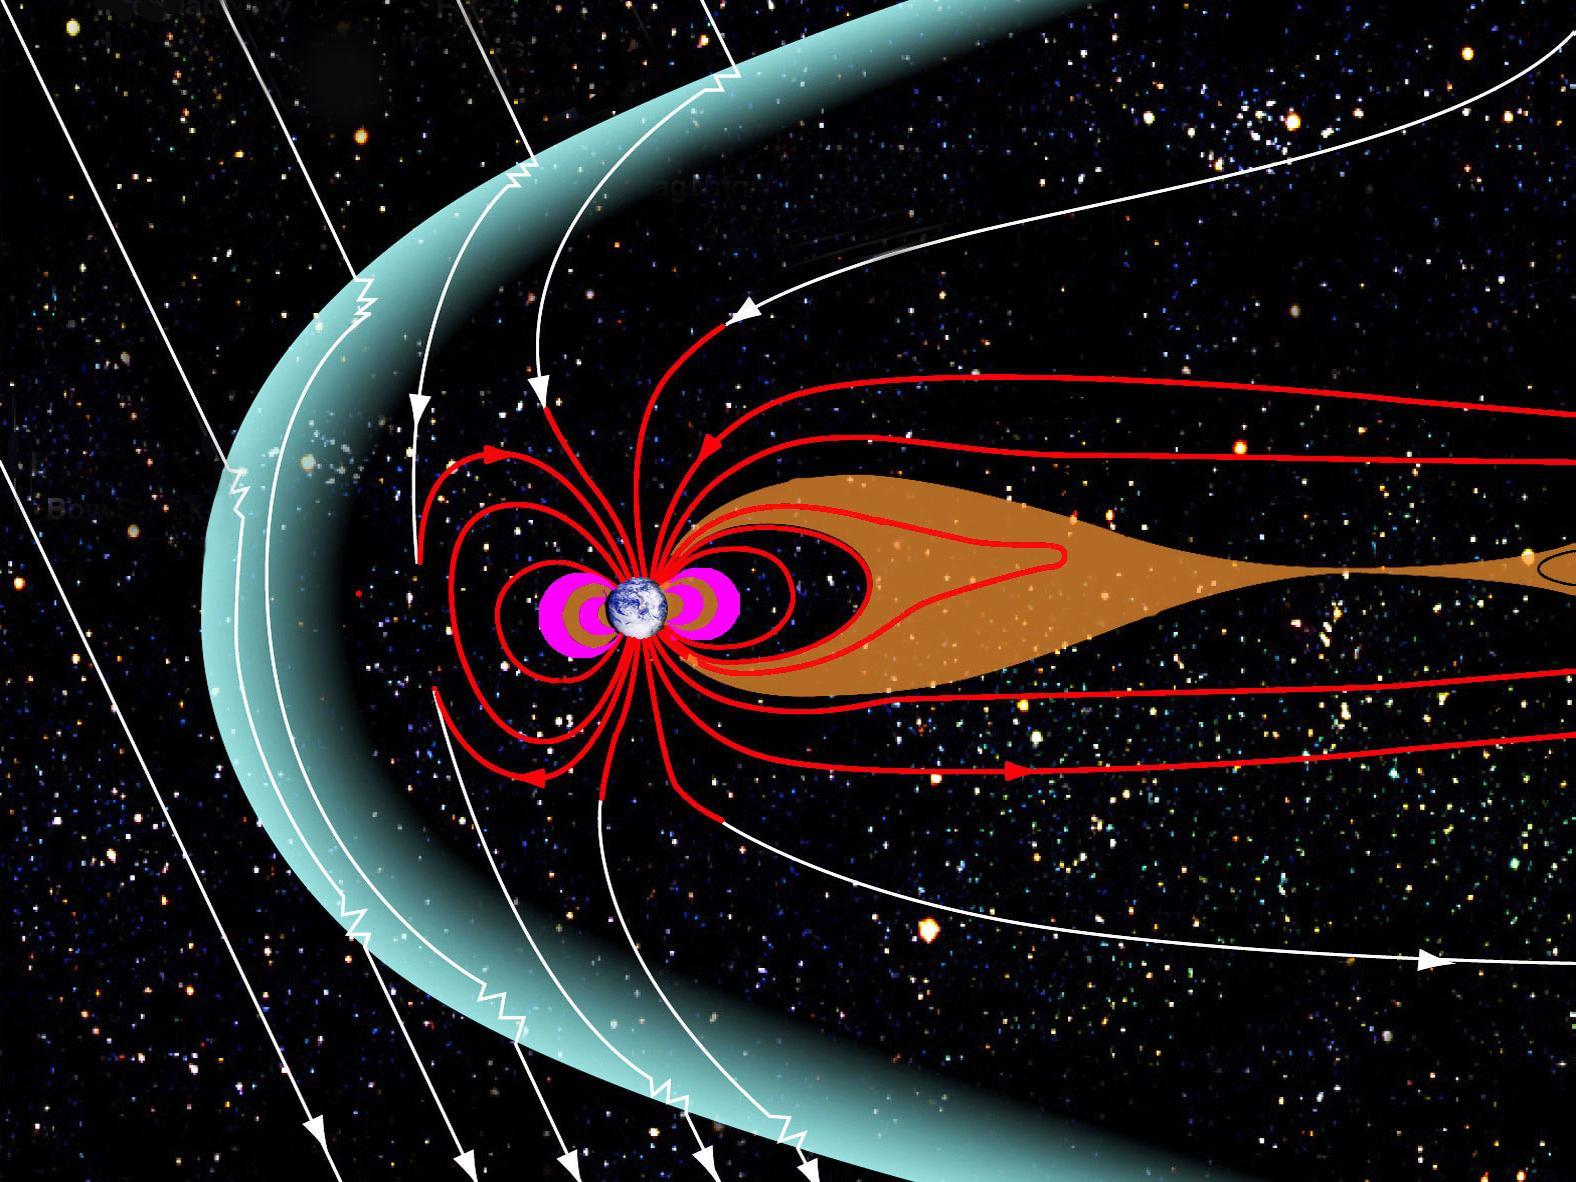 Earth's Magnetosphere and Plasmasheet   NASA